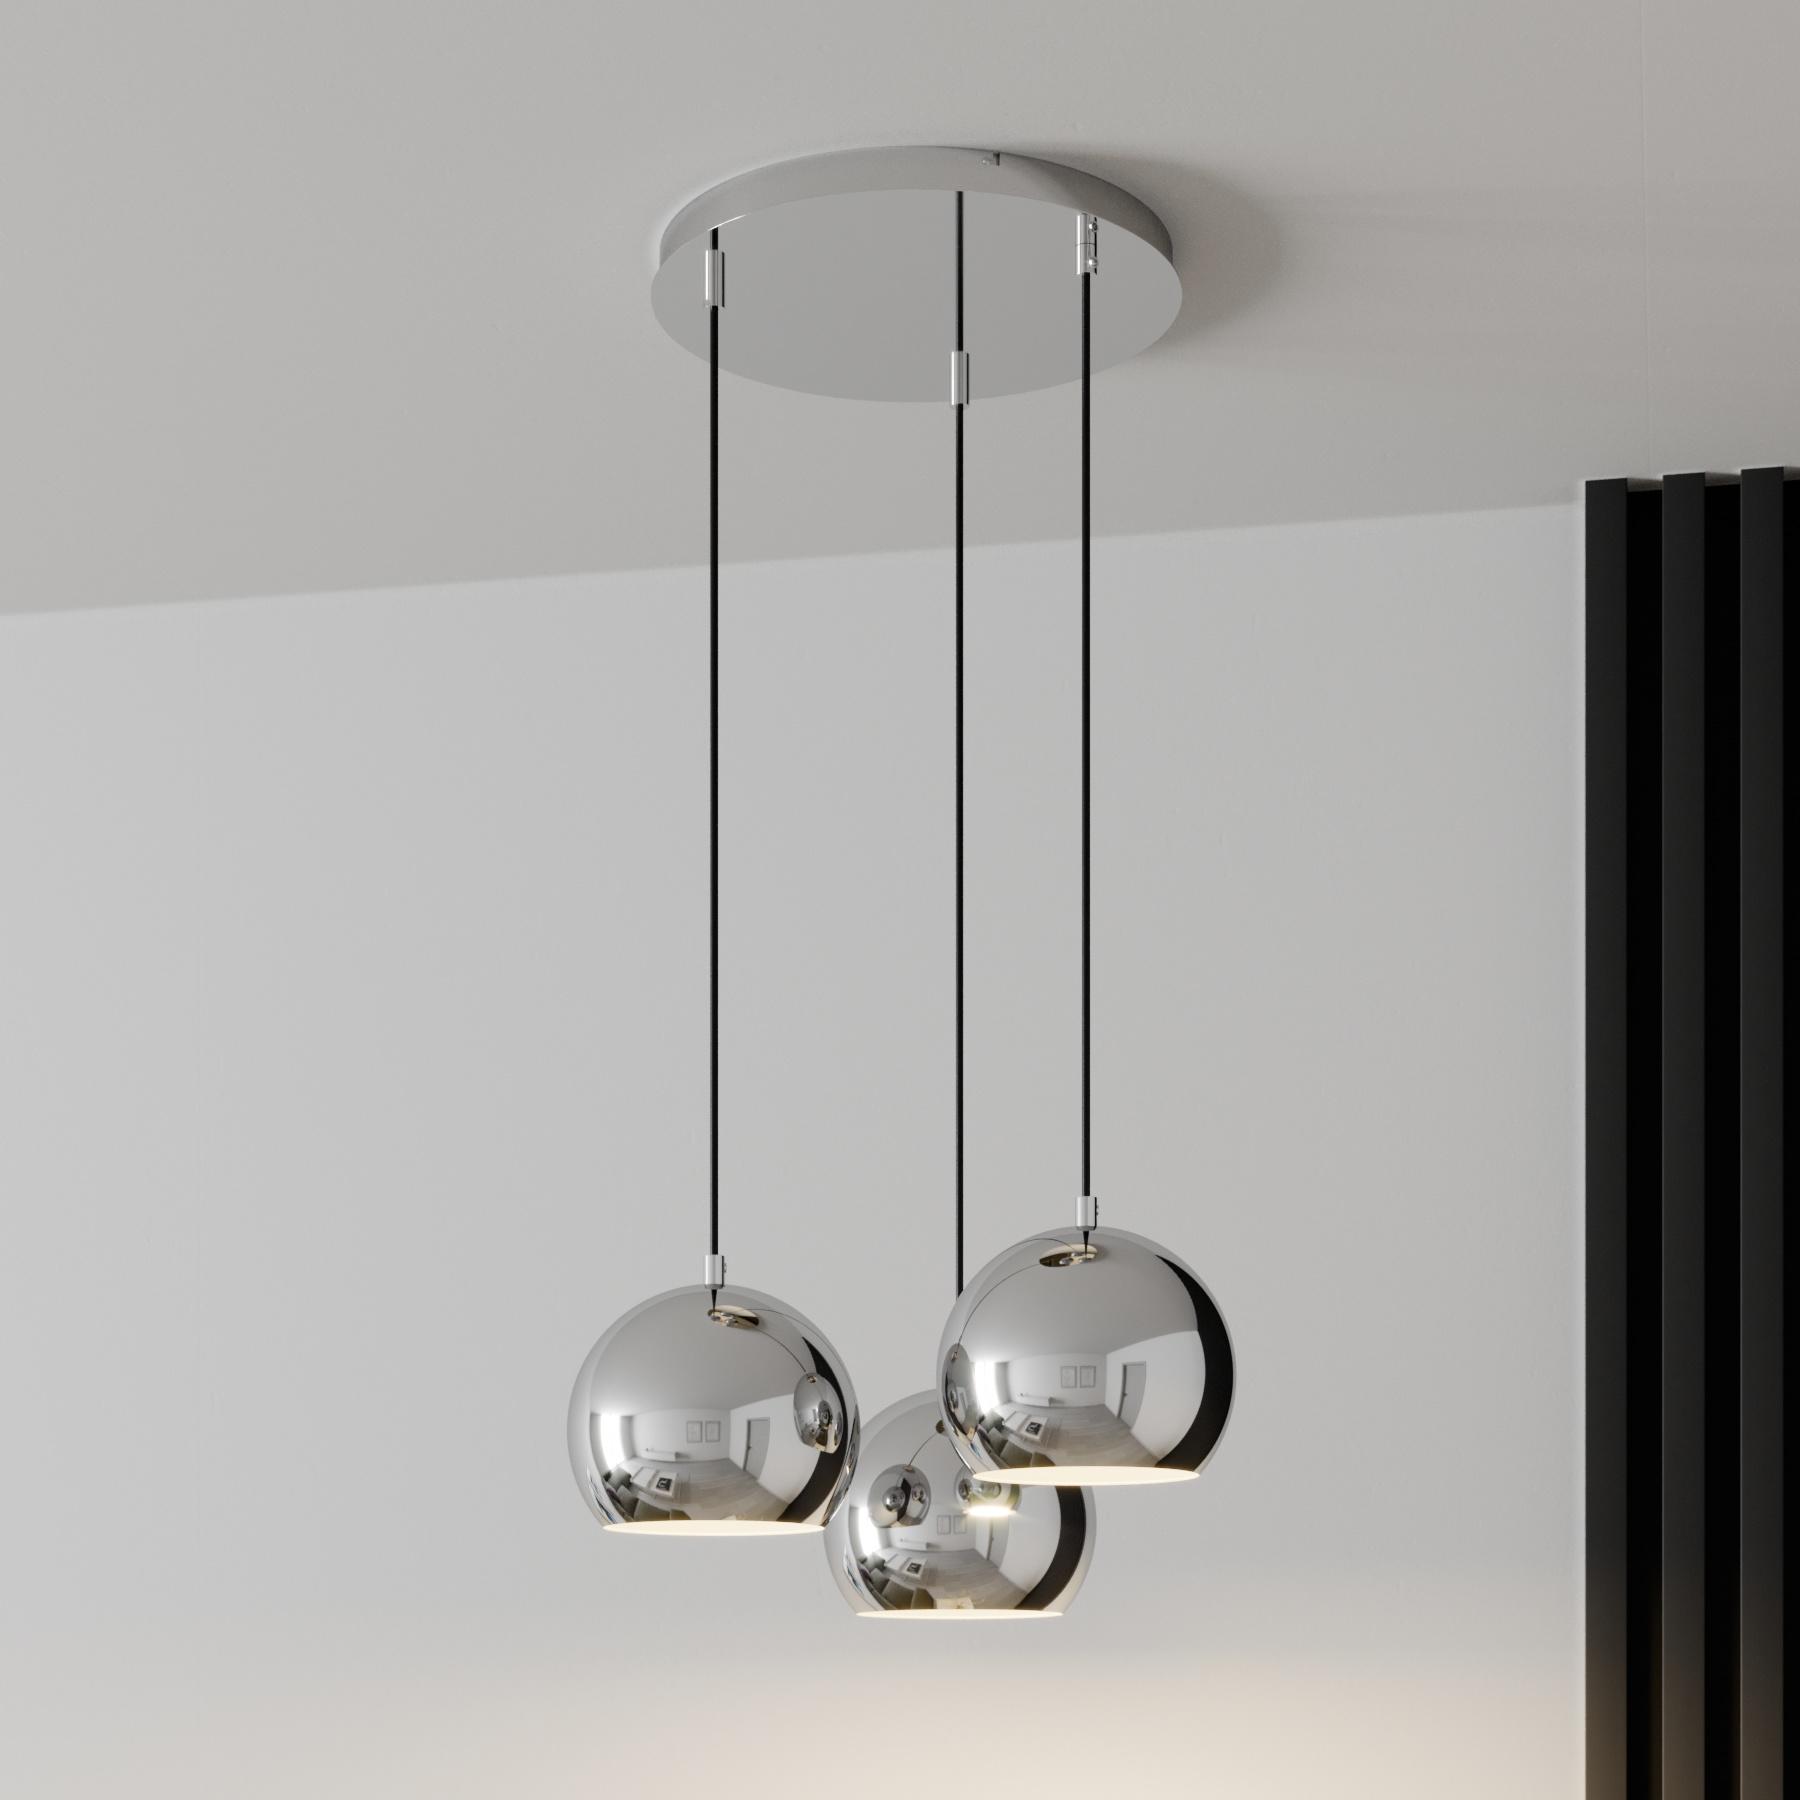 Hanglamp Cool, 3-lamps rond, chroom